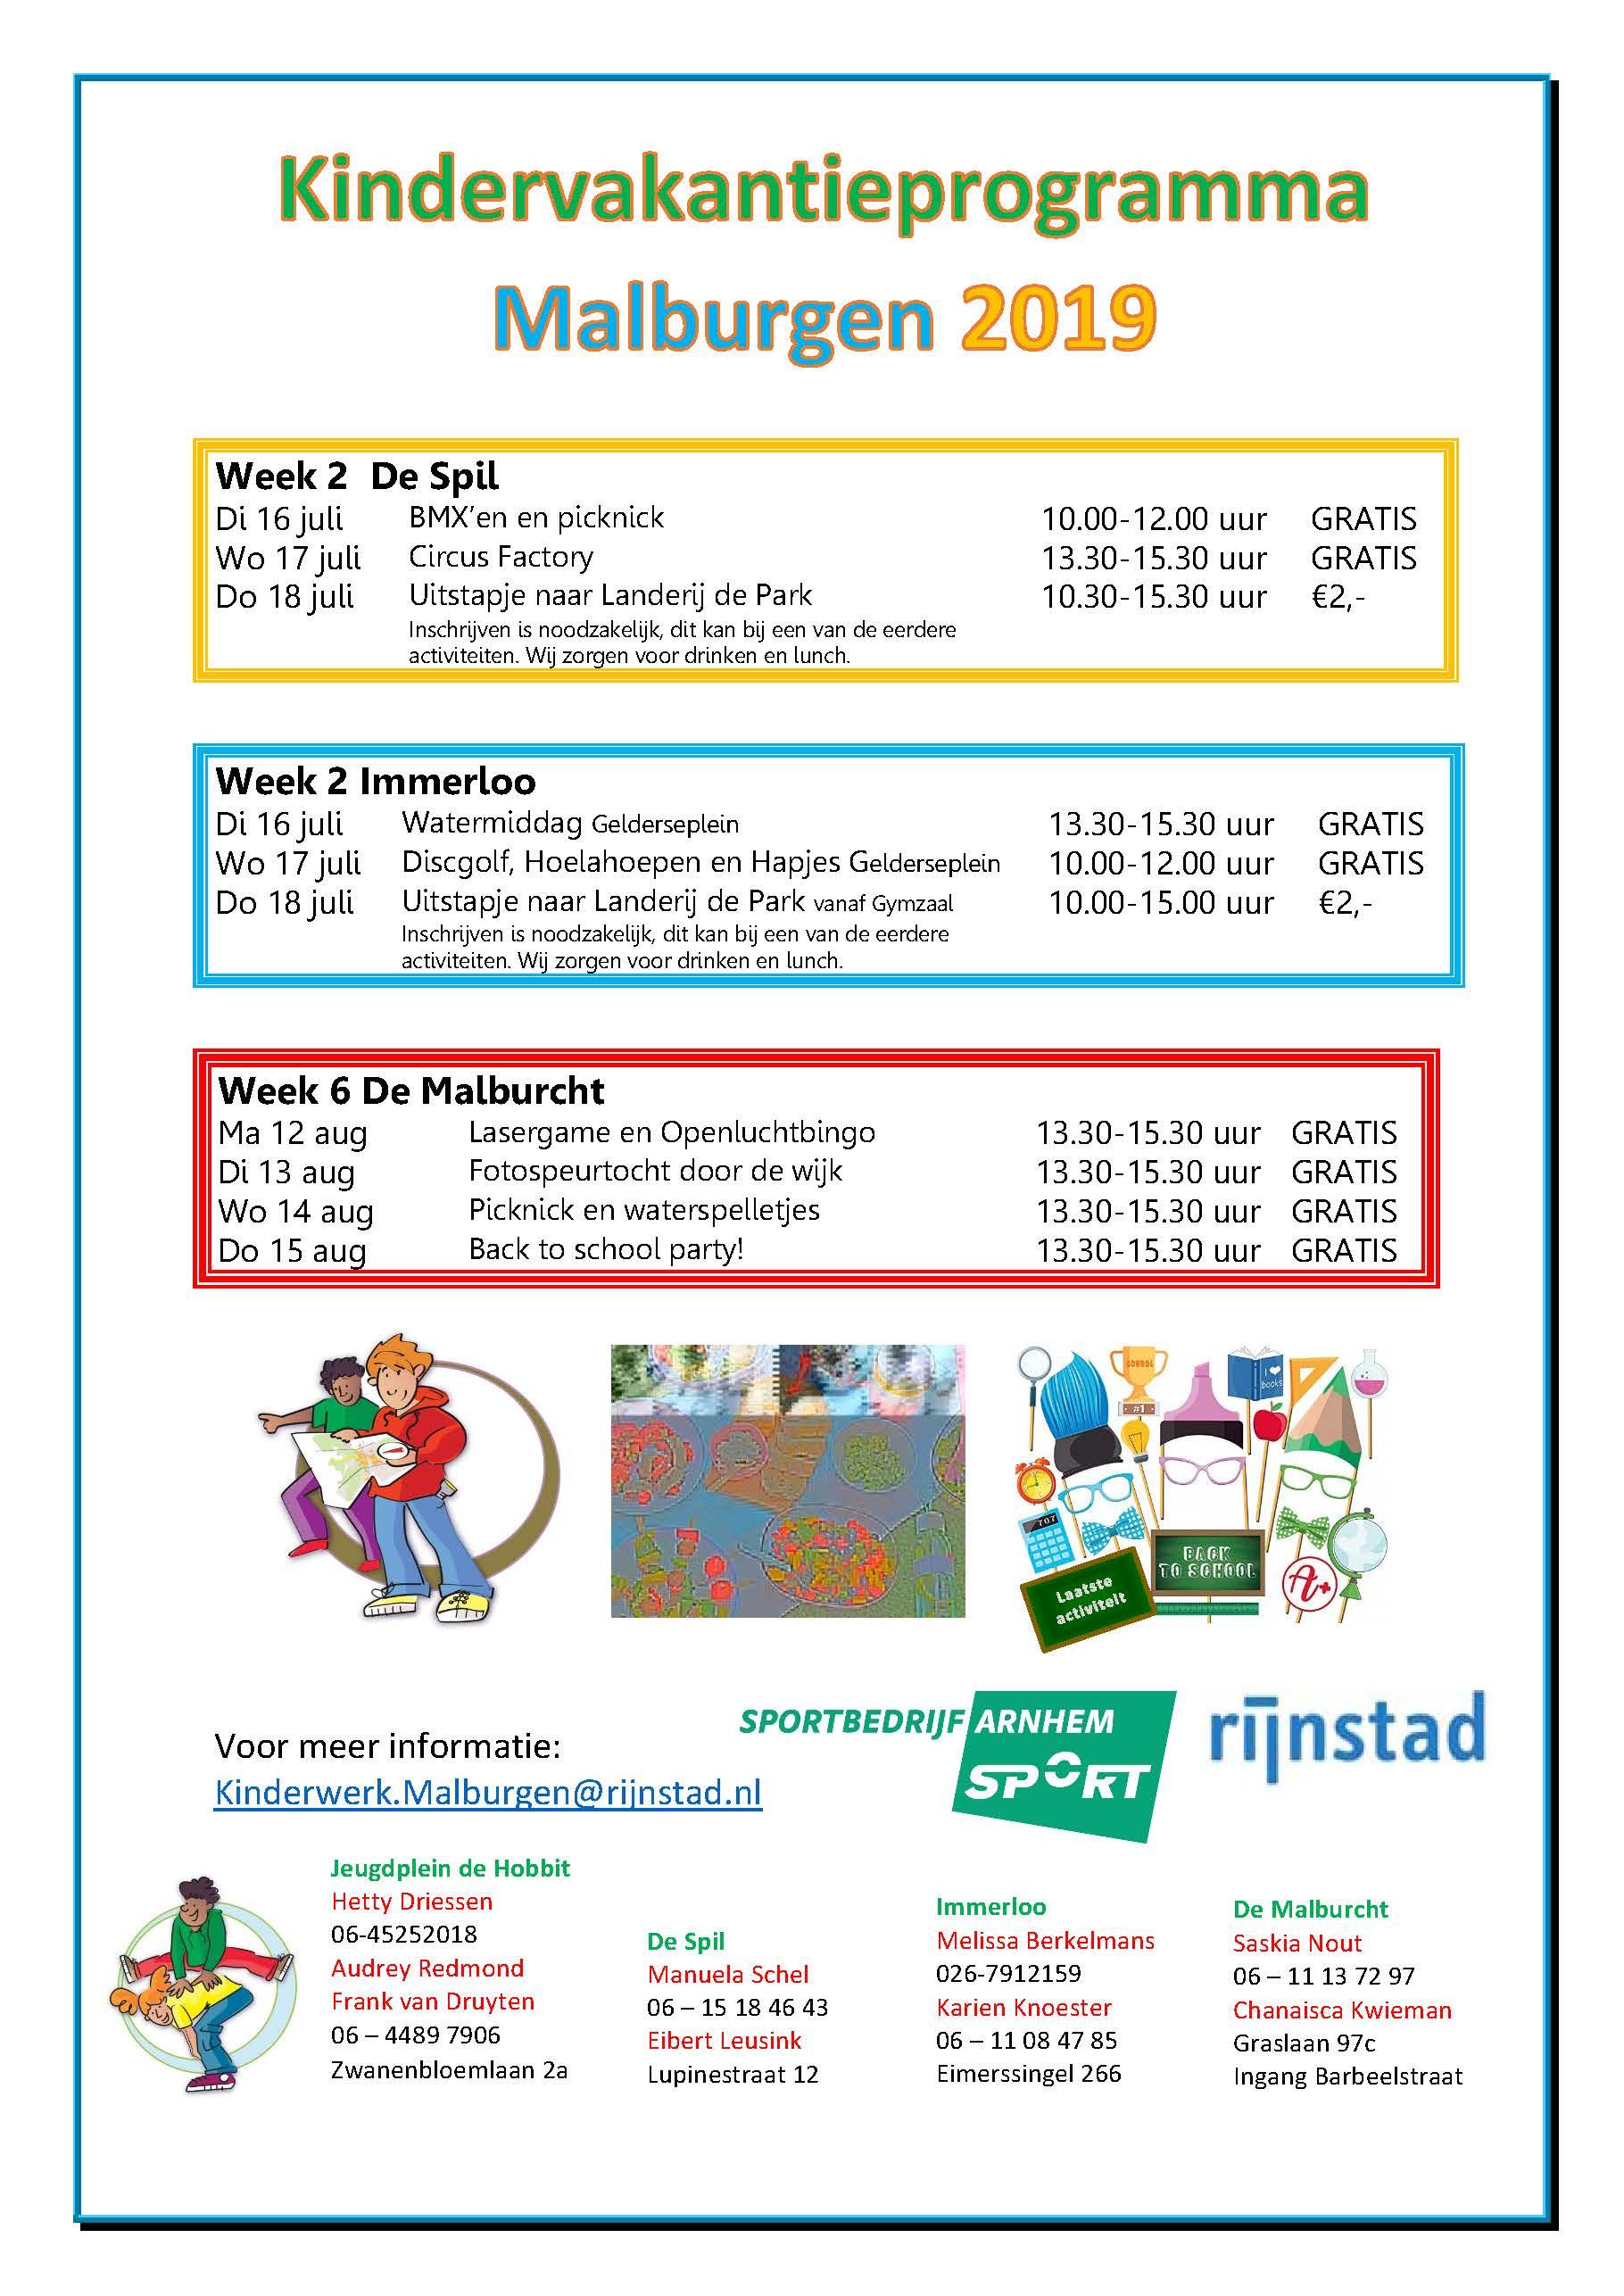 Rijnstad & Sportbedrijf